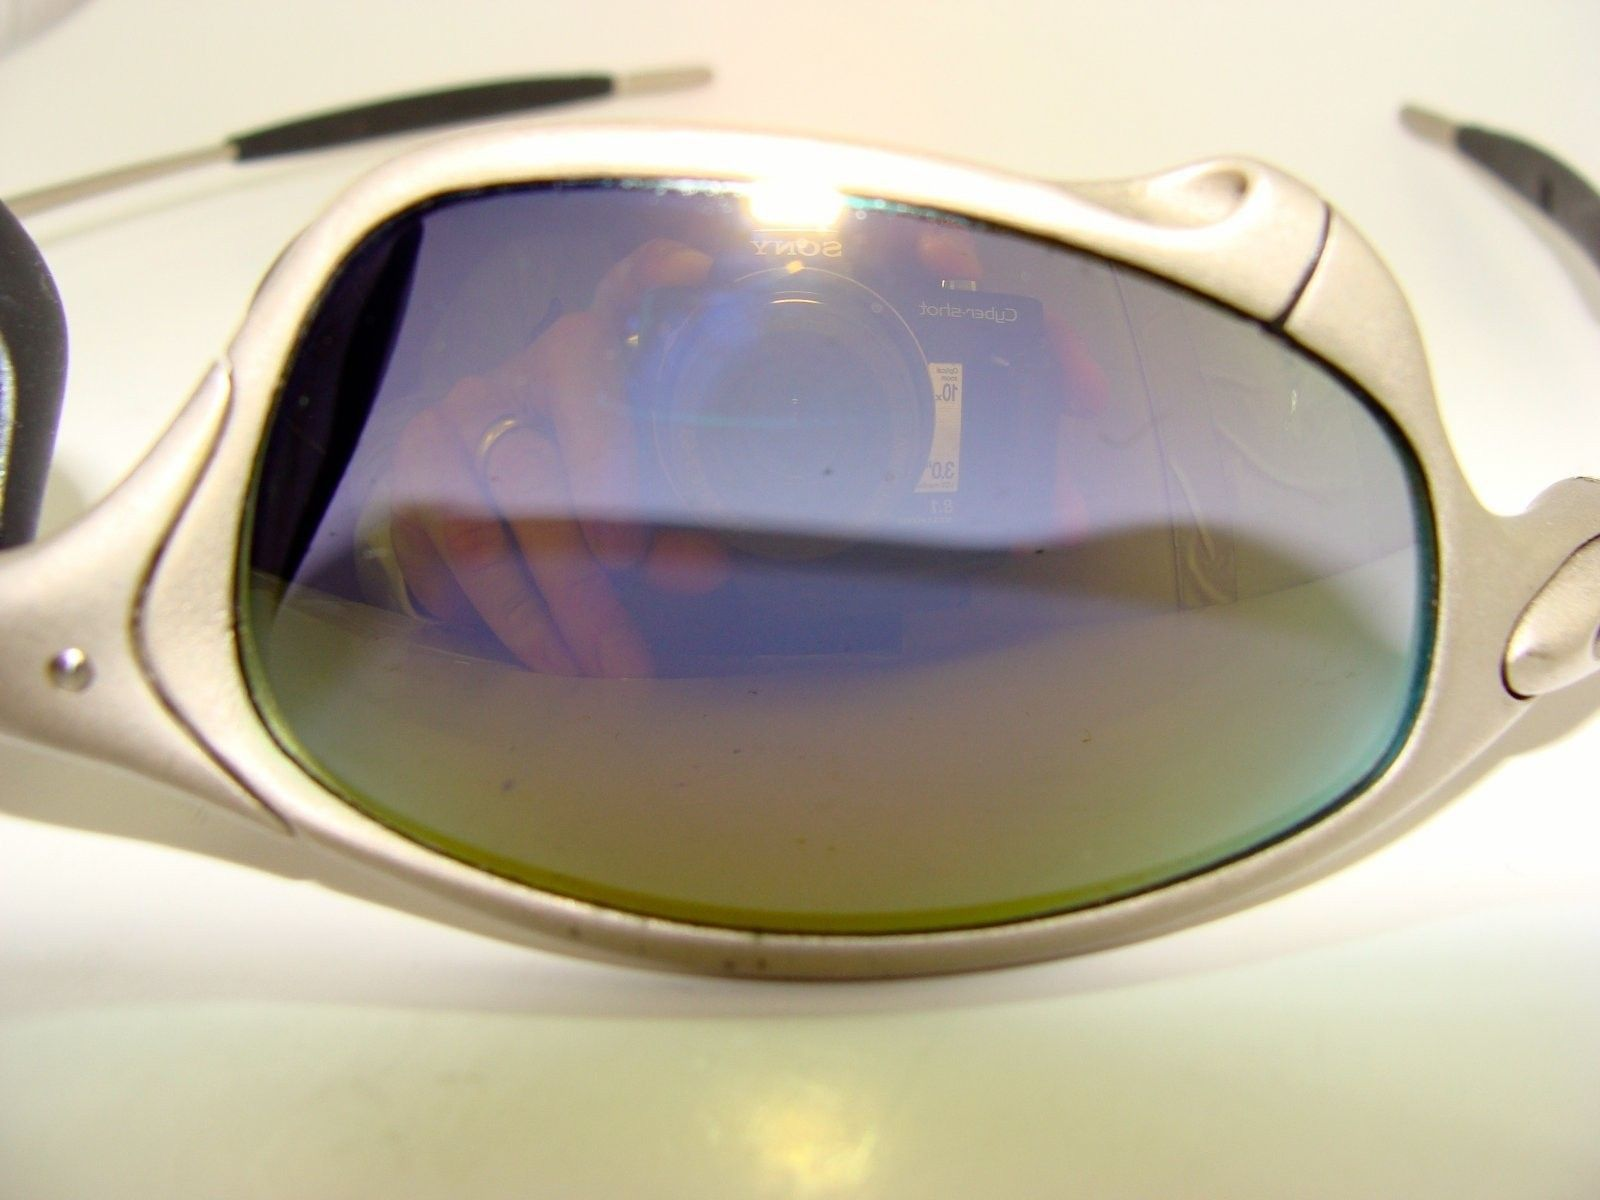 1st Gen Juliet Plasma Emerald 04-115 $400 Shipped CONUS - Oakley Emerald Juliet10.jpg